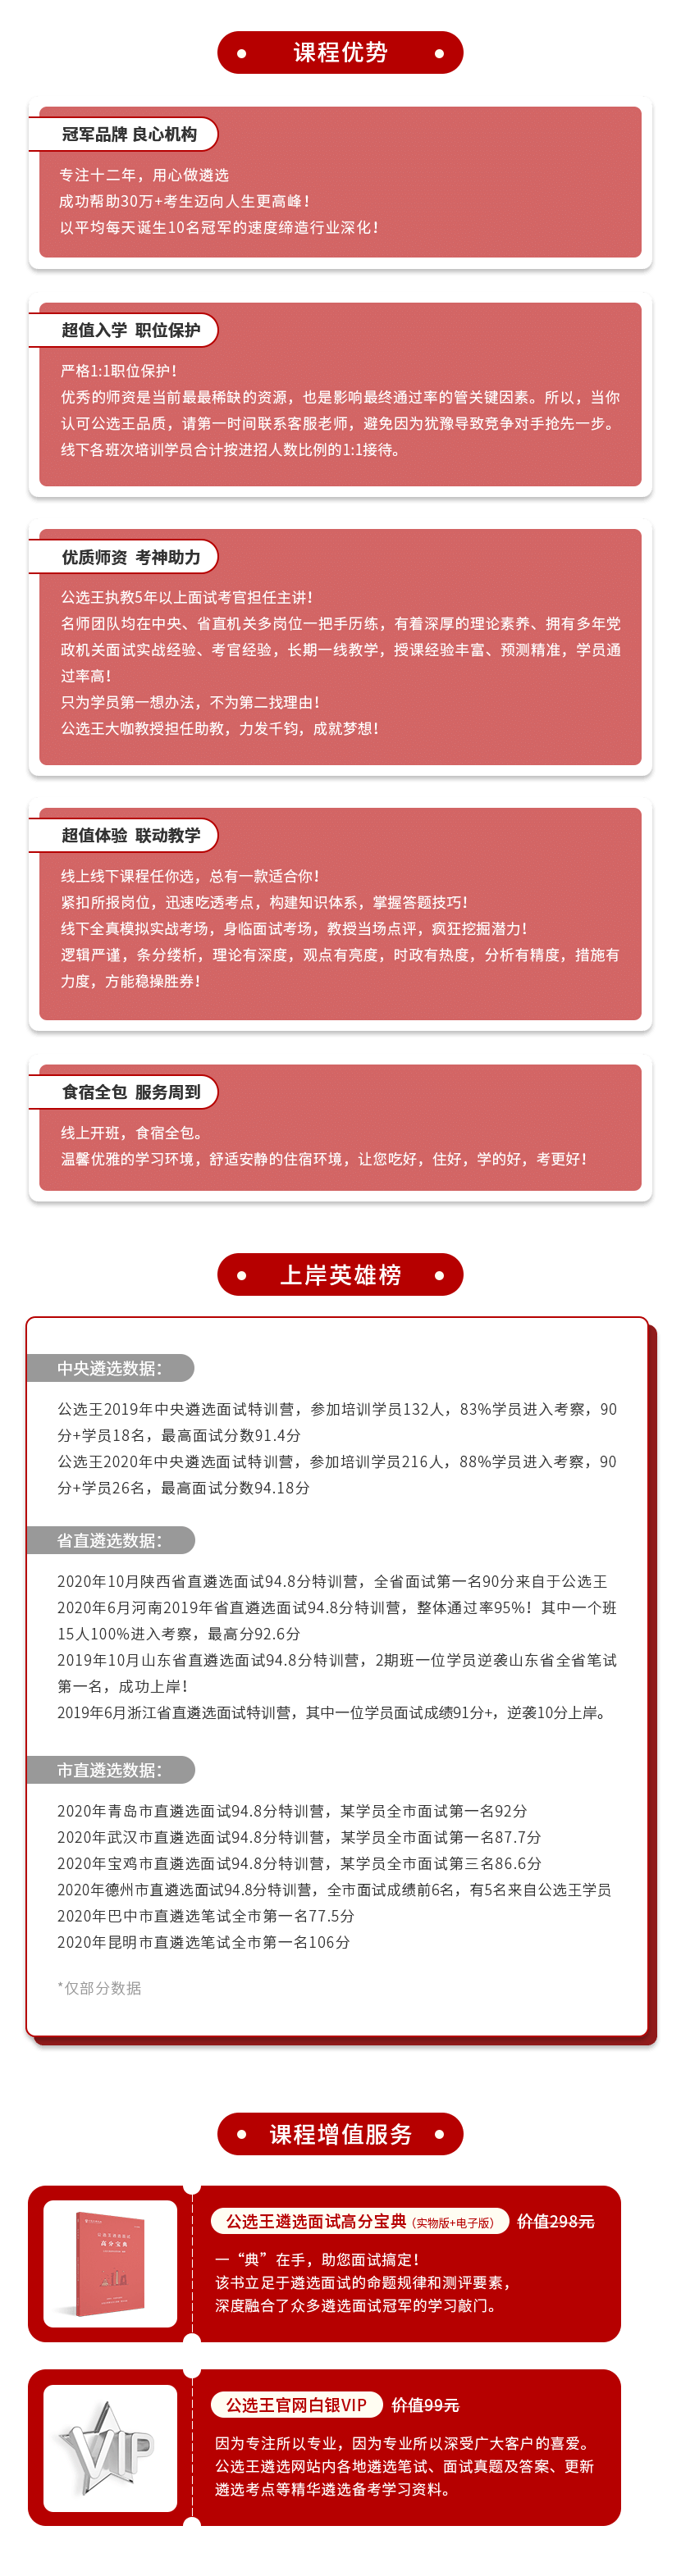 2021年-更新版_看图王.png